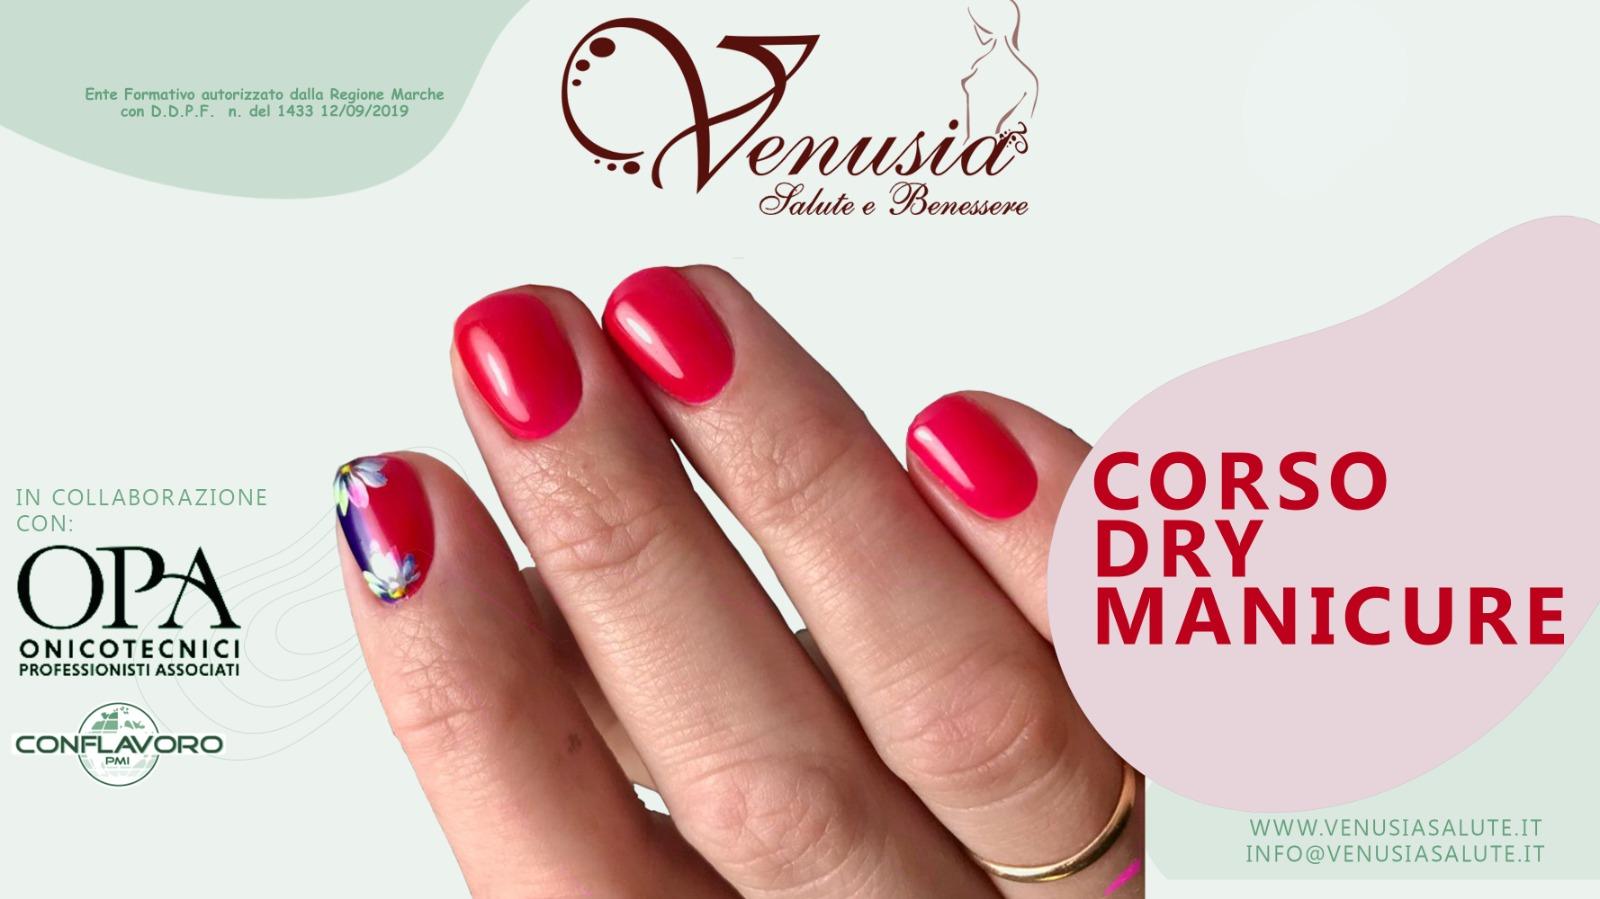 Corso unghie dry manicure